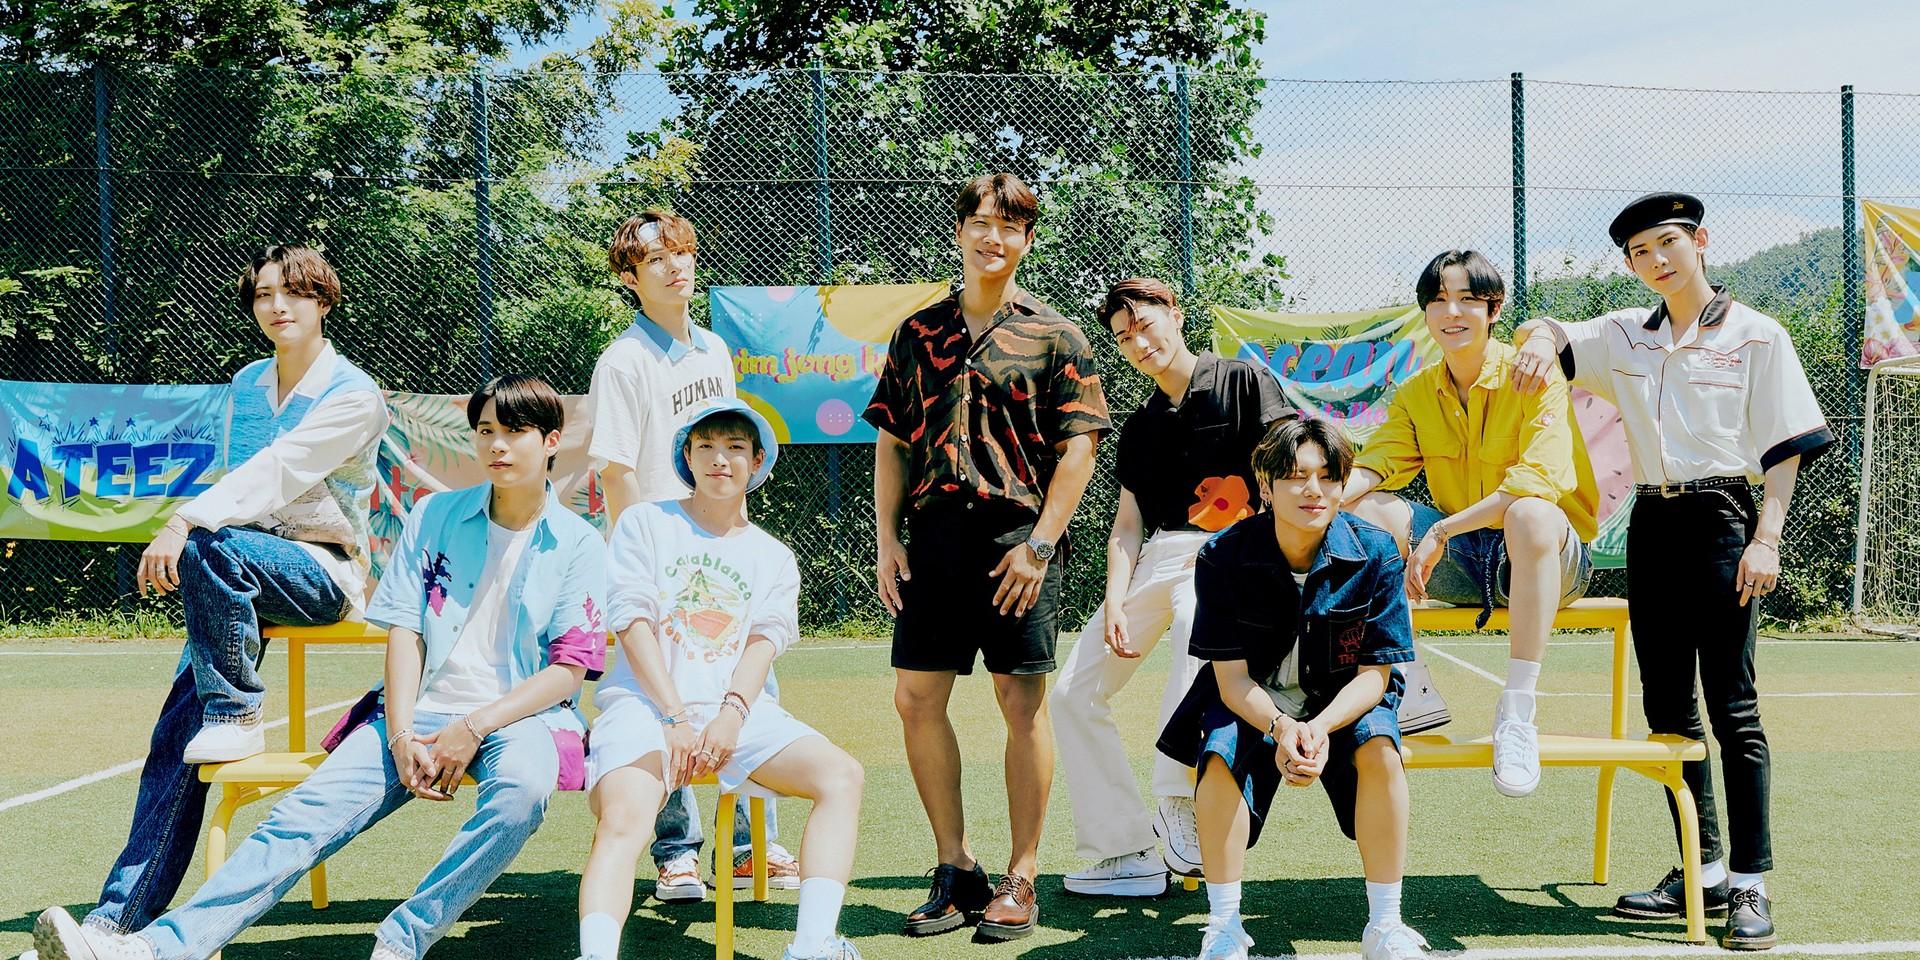 ATEEZ and Kim Jong Kook unveil summer collaborative mini-album 'Season Songs' – watch